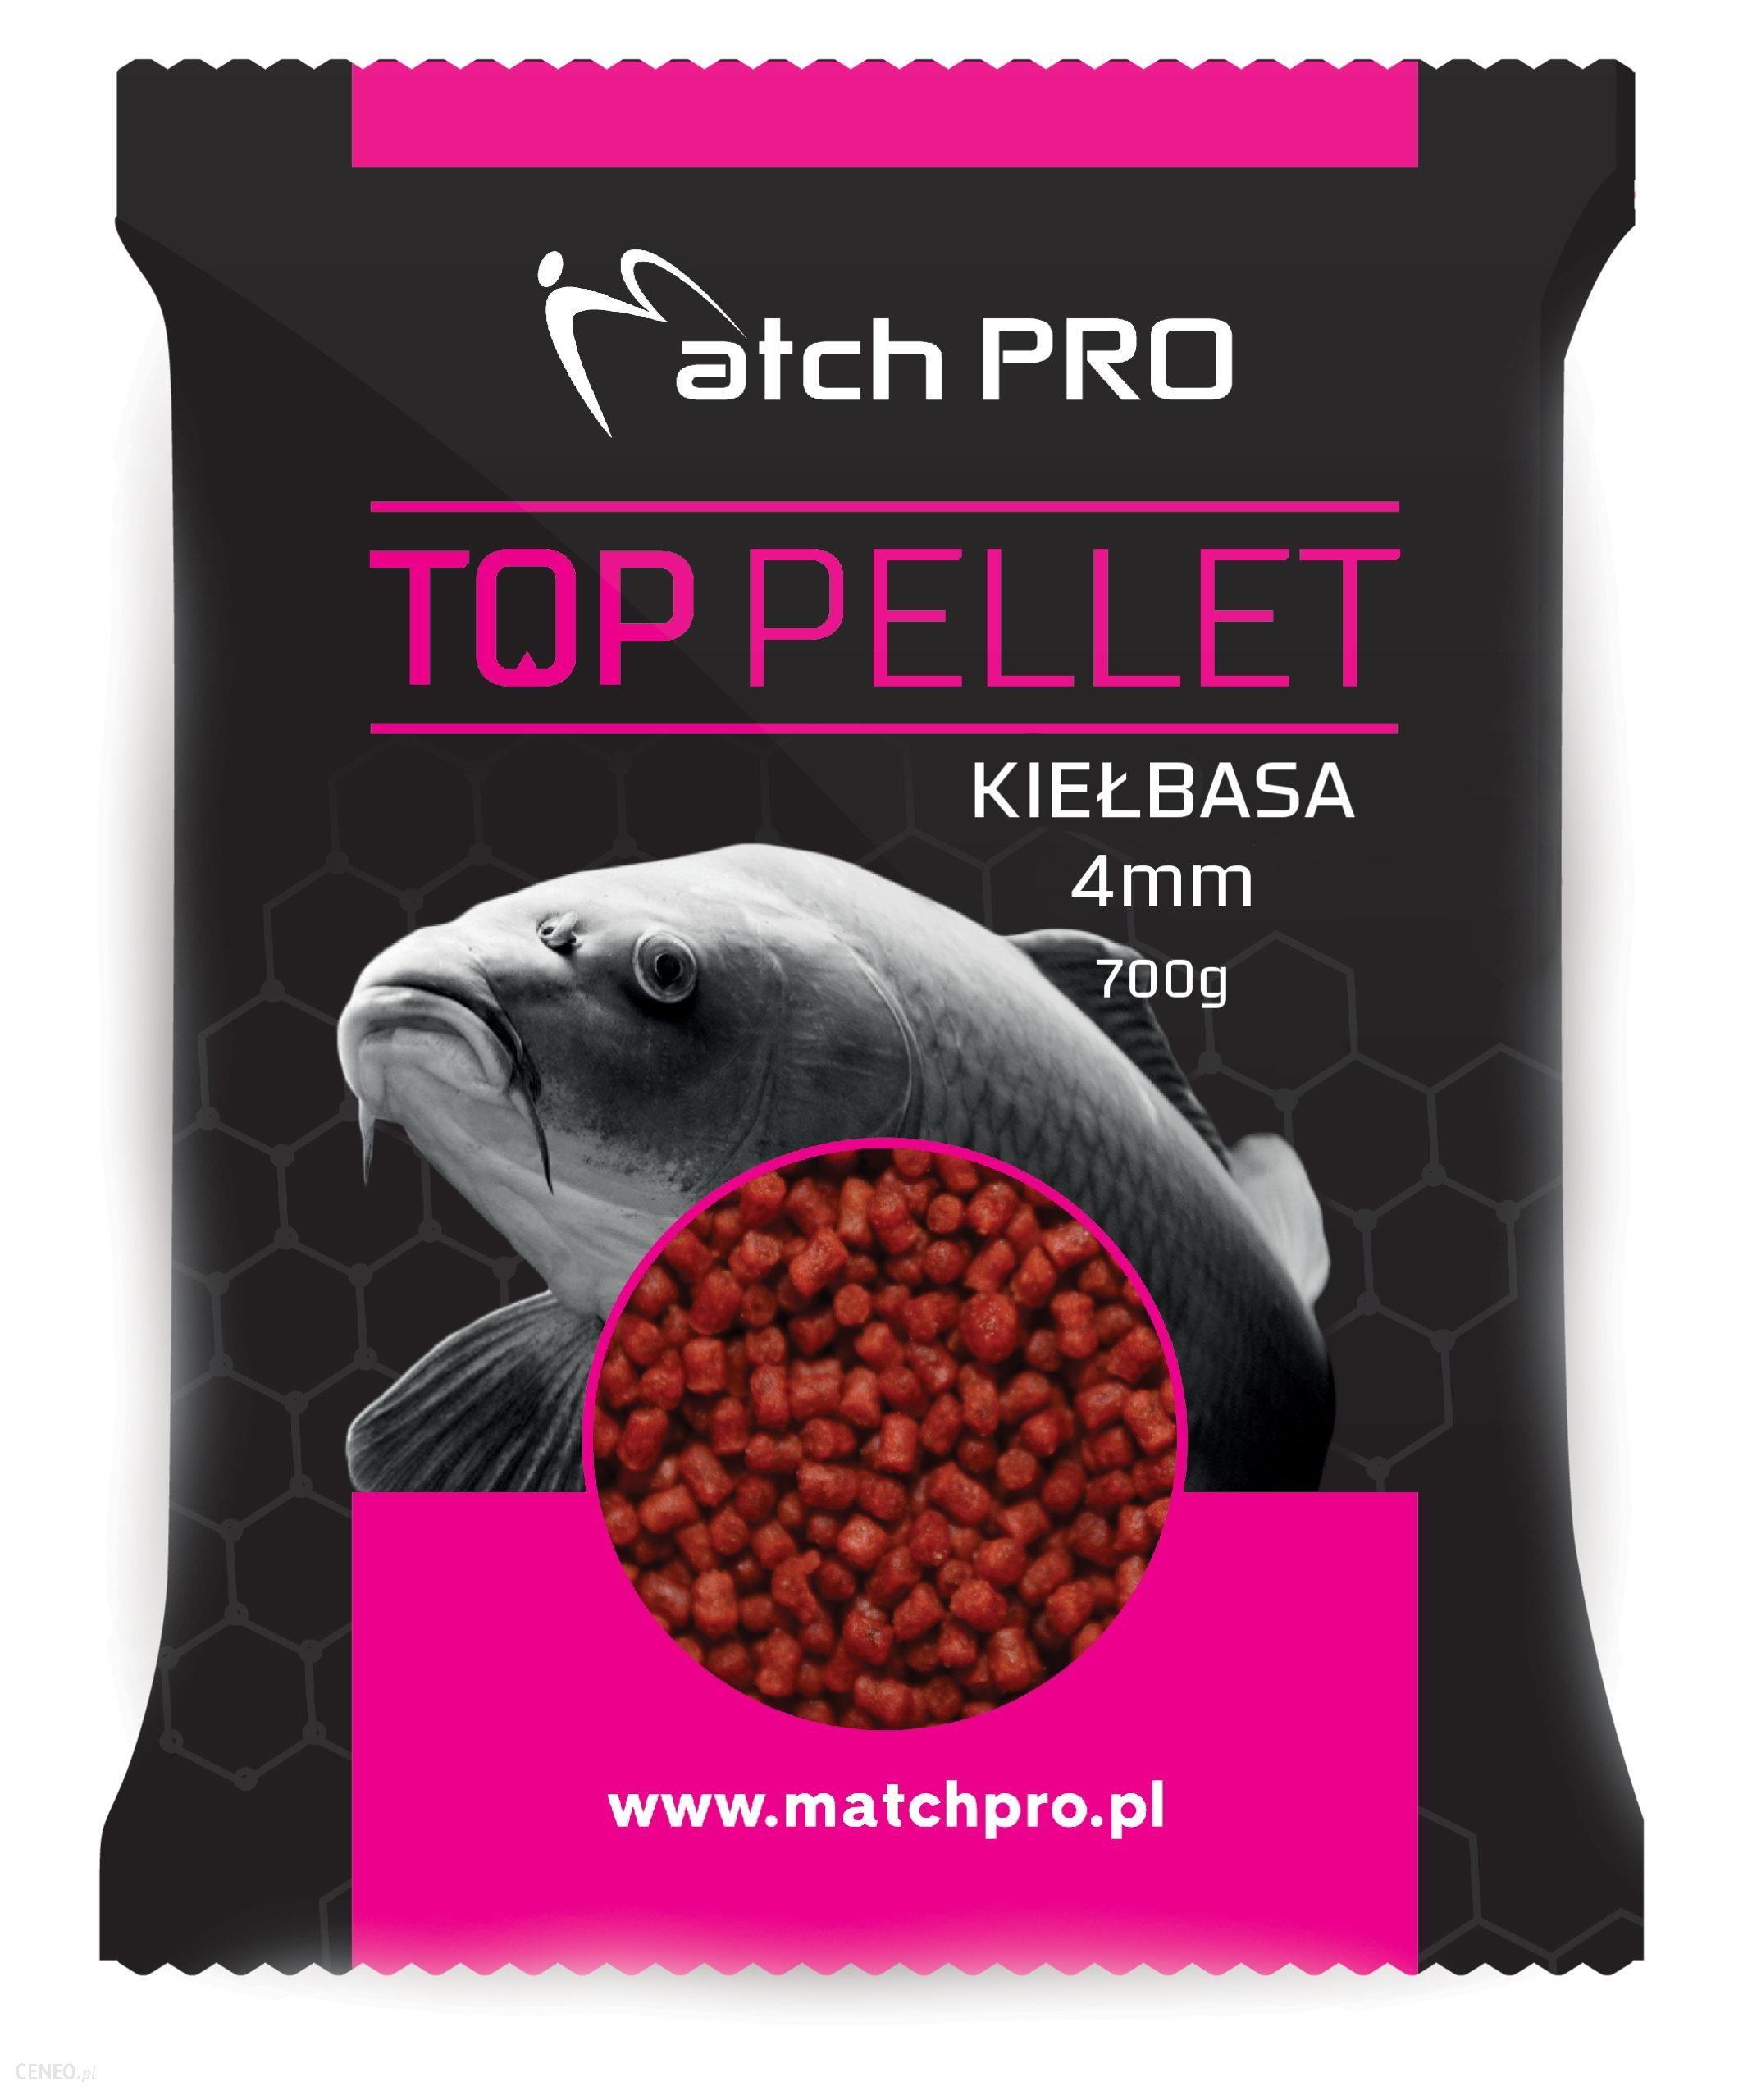 Matchpro Kiełbasa 4Mm Pellet 700G